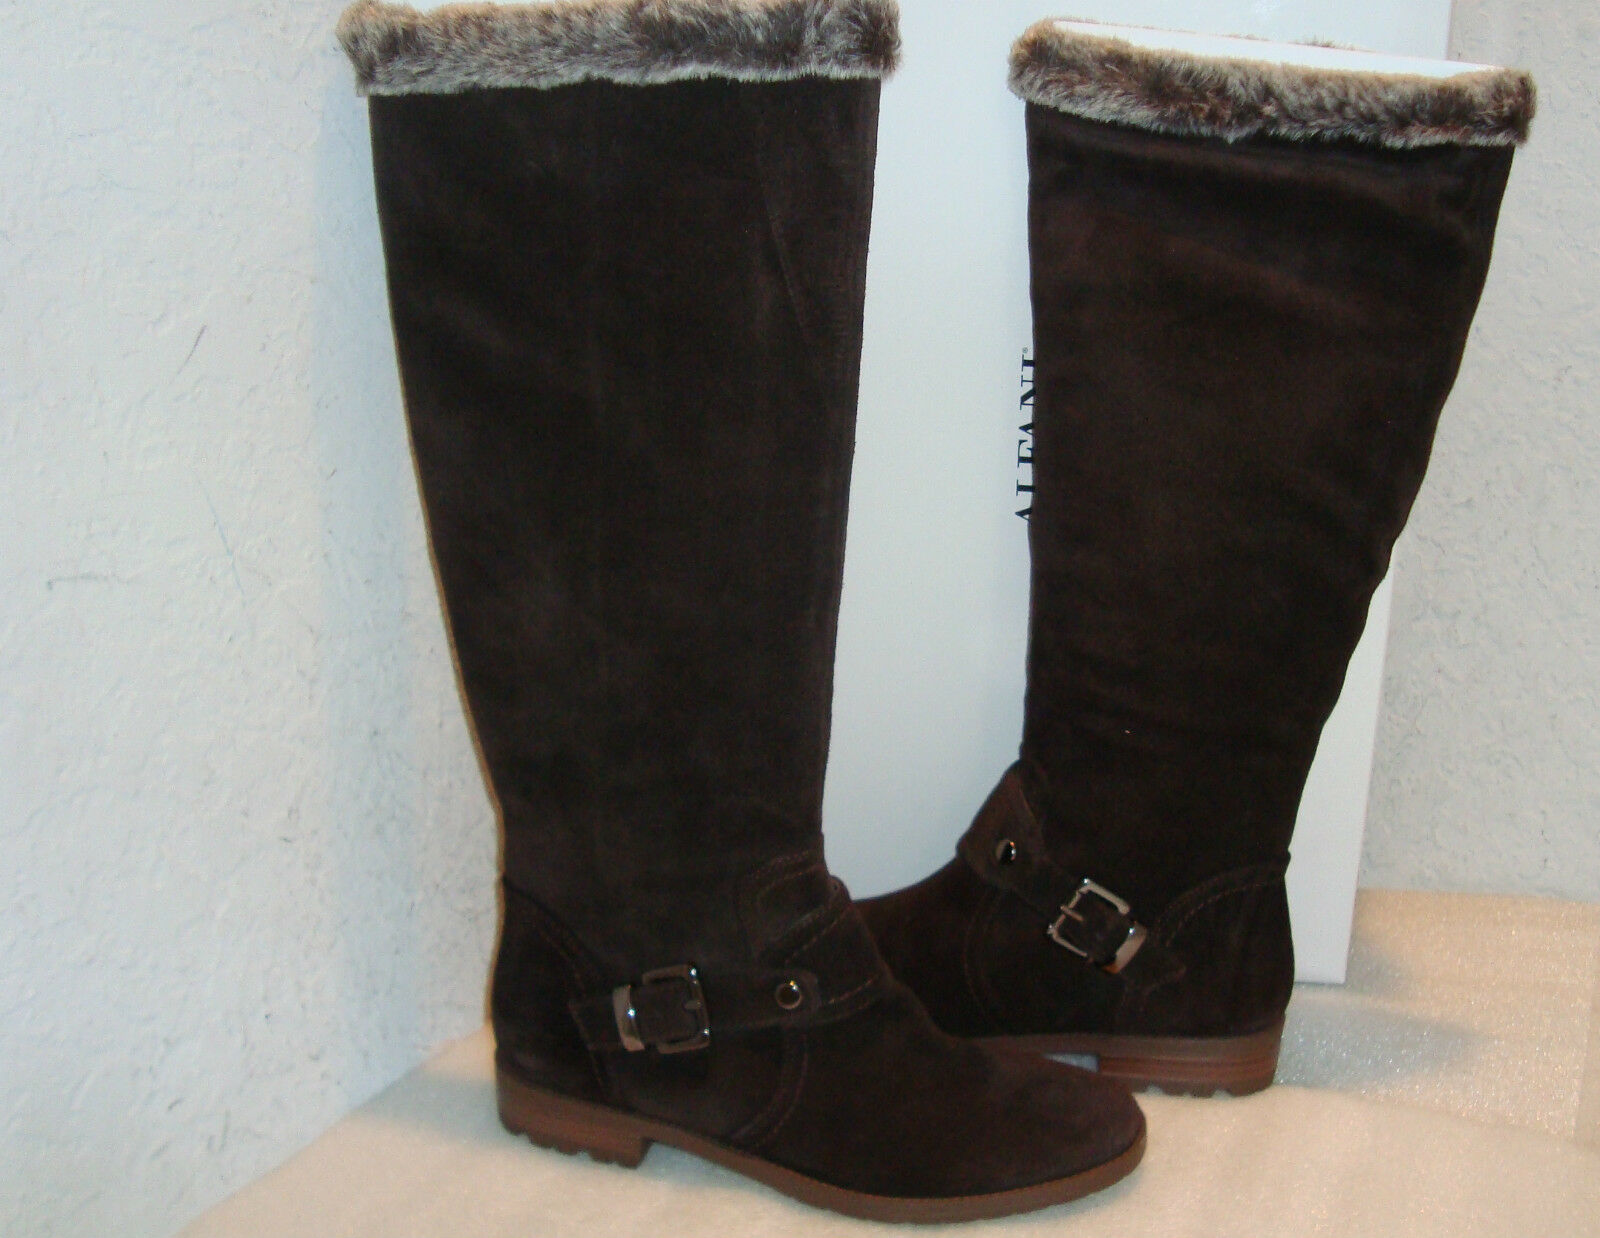 Alfani Damenschuhe NWB Sage Dark Braun Stiefel Schuhes 6 MED NEU